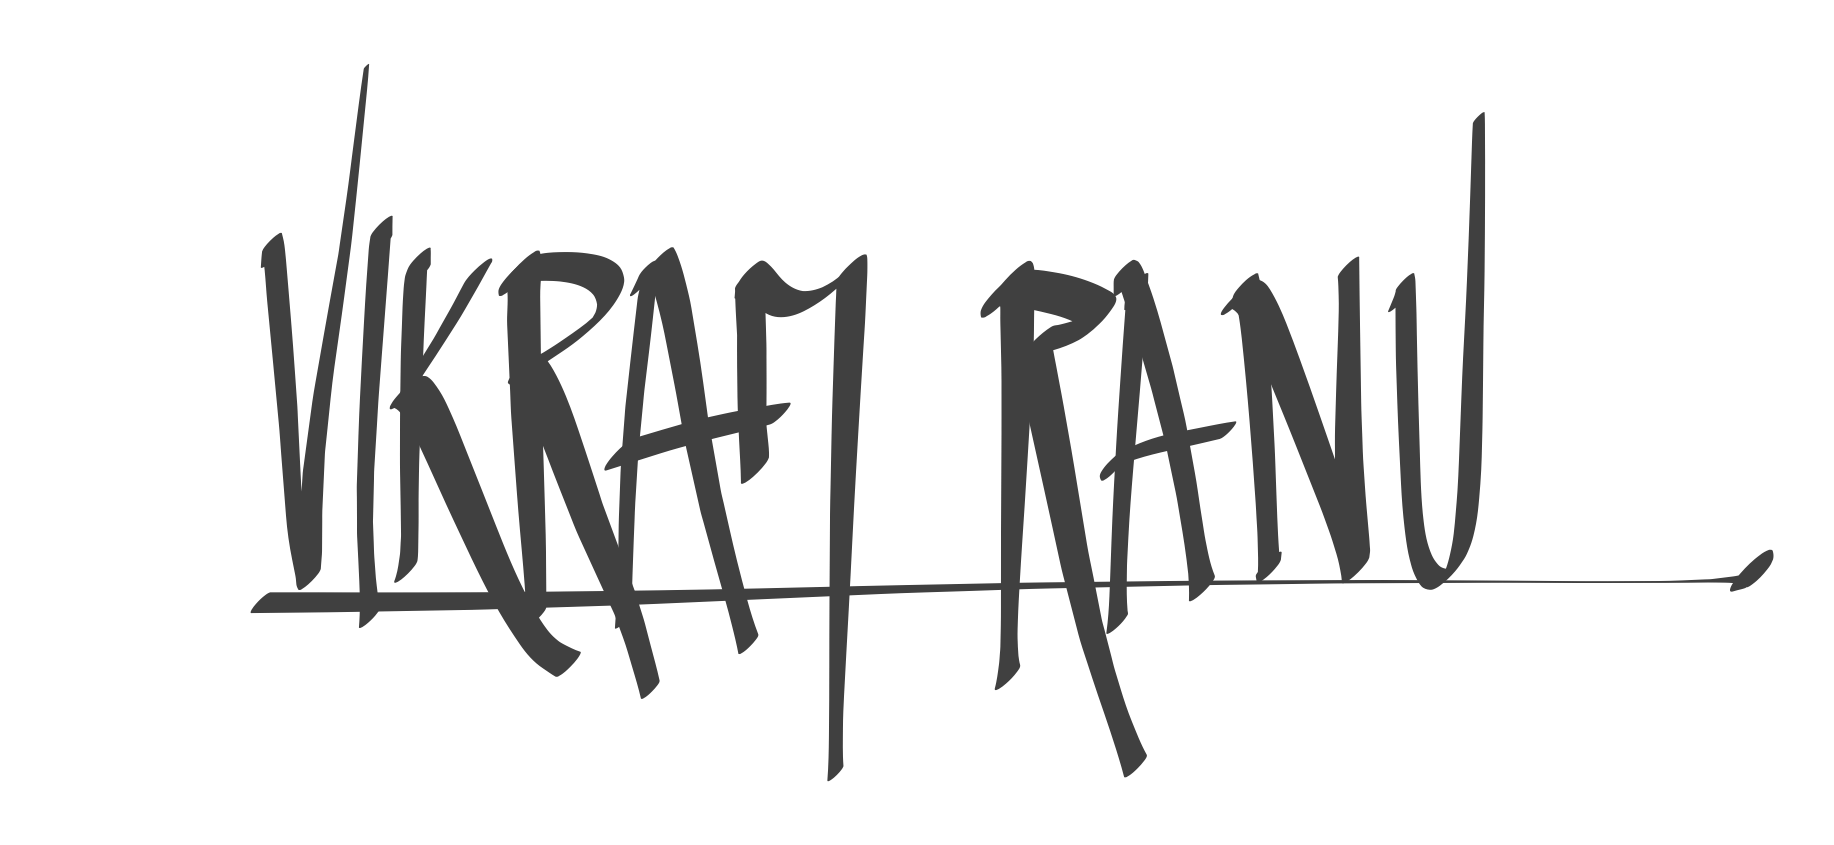 Vikram Ranu's Signature